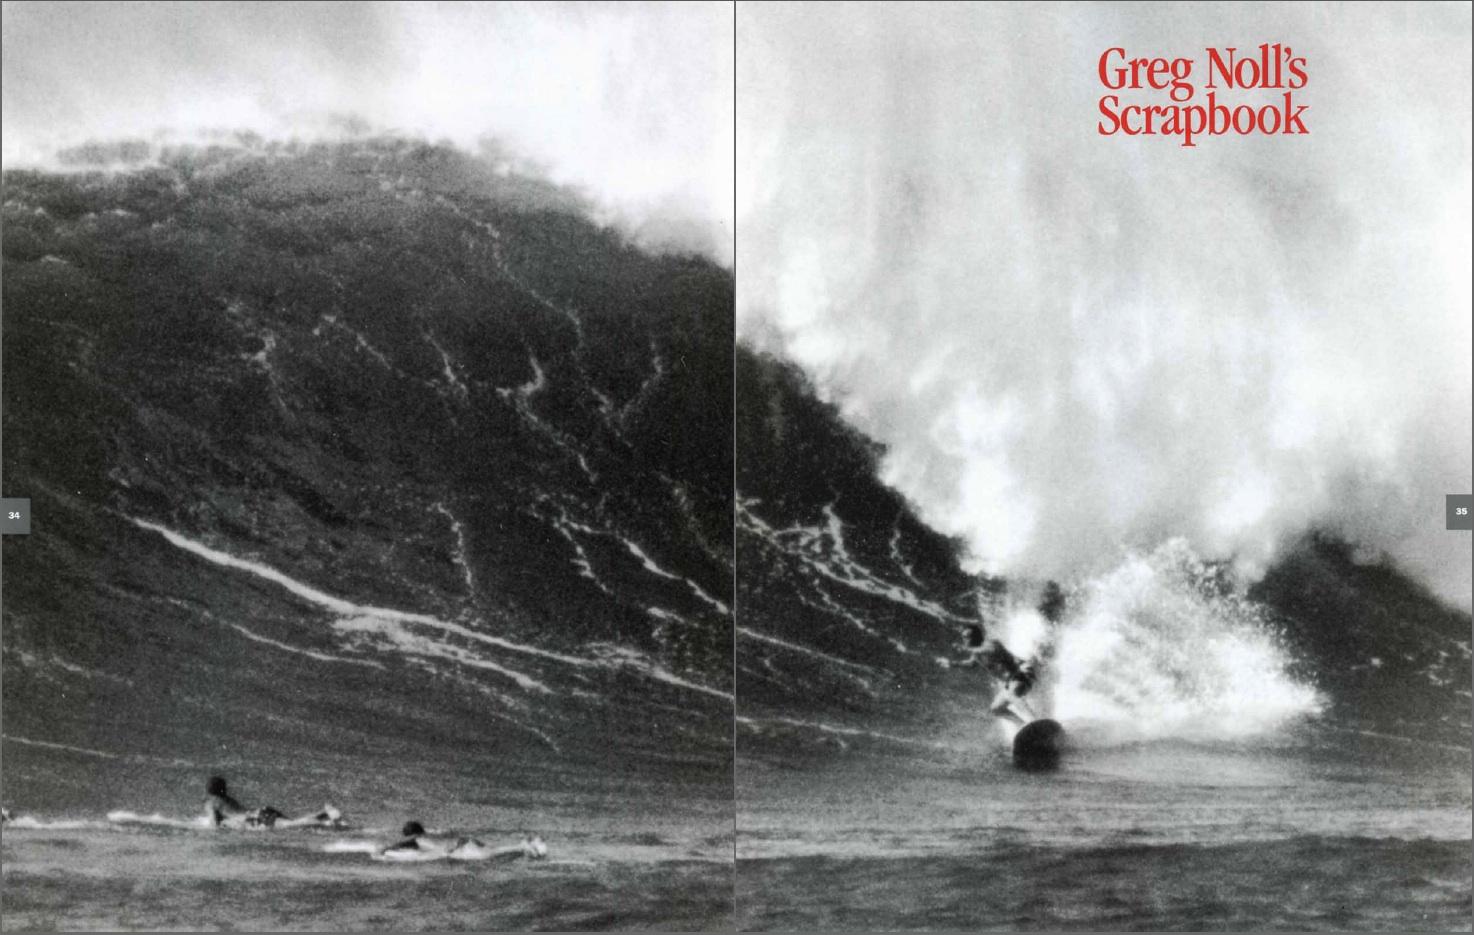 Greg Noll's Scrapbook